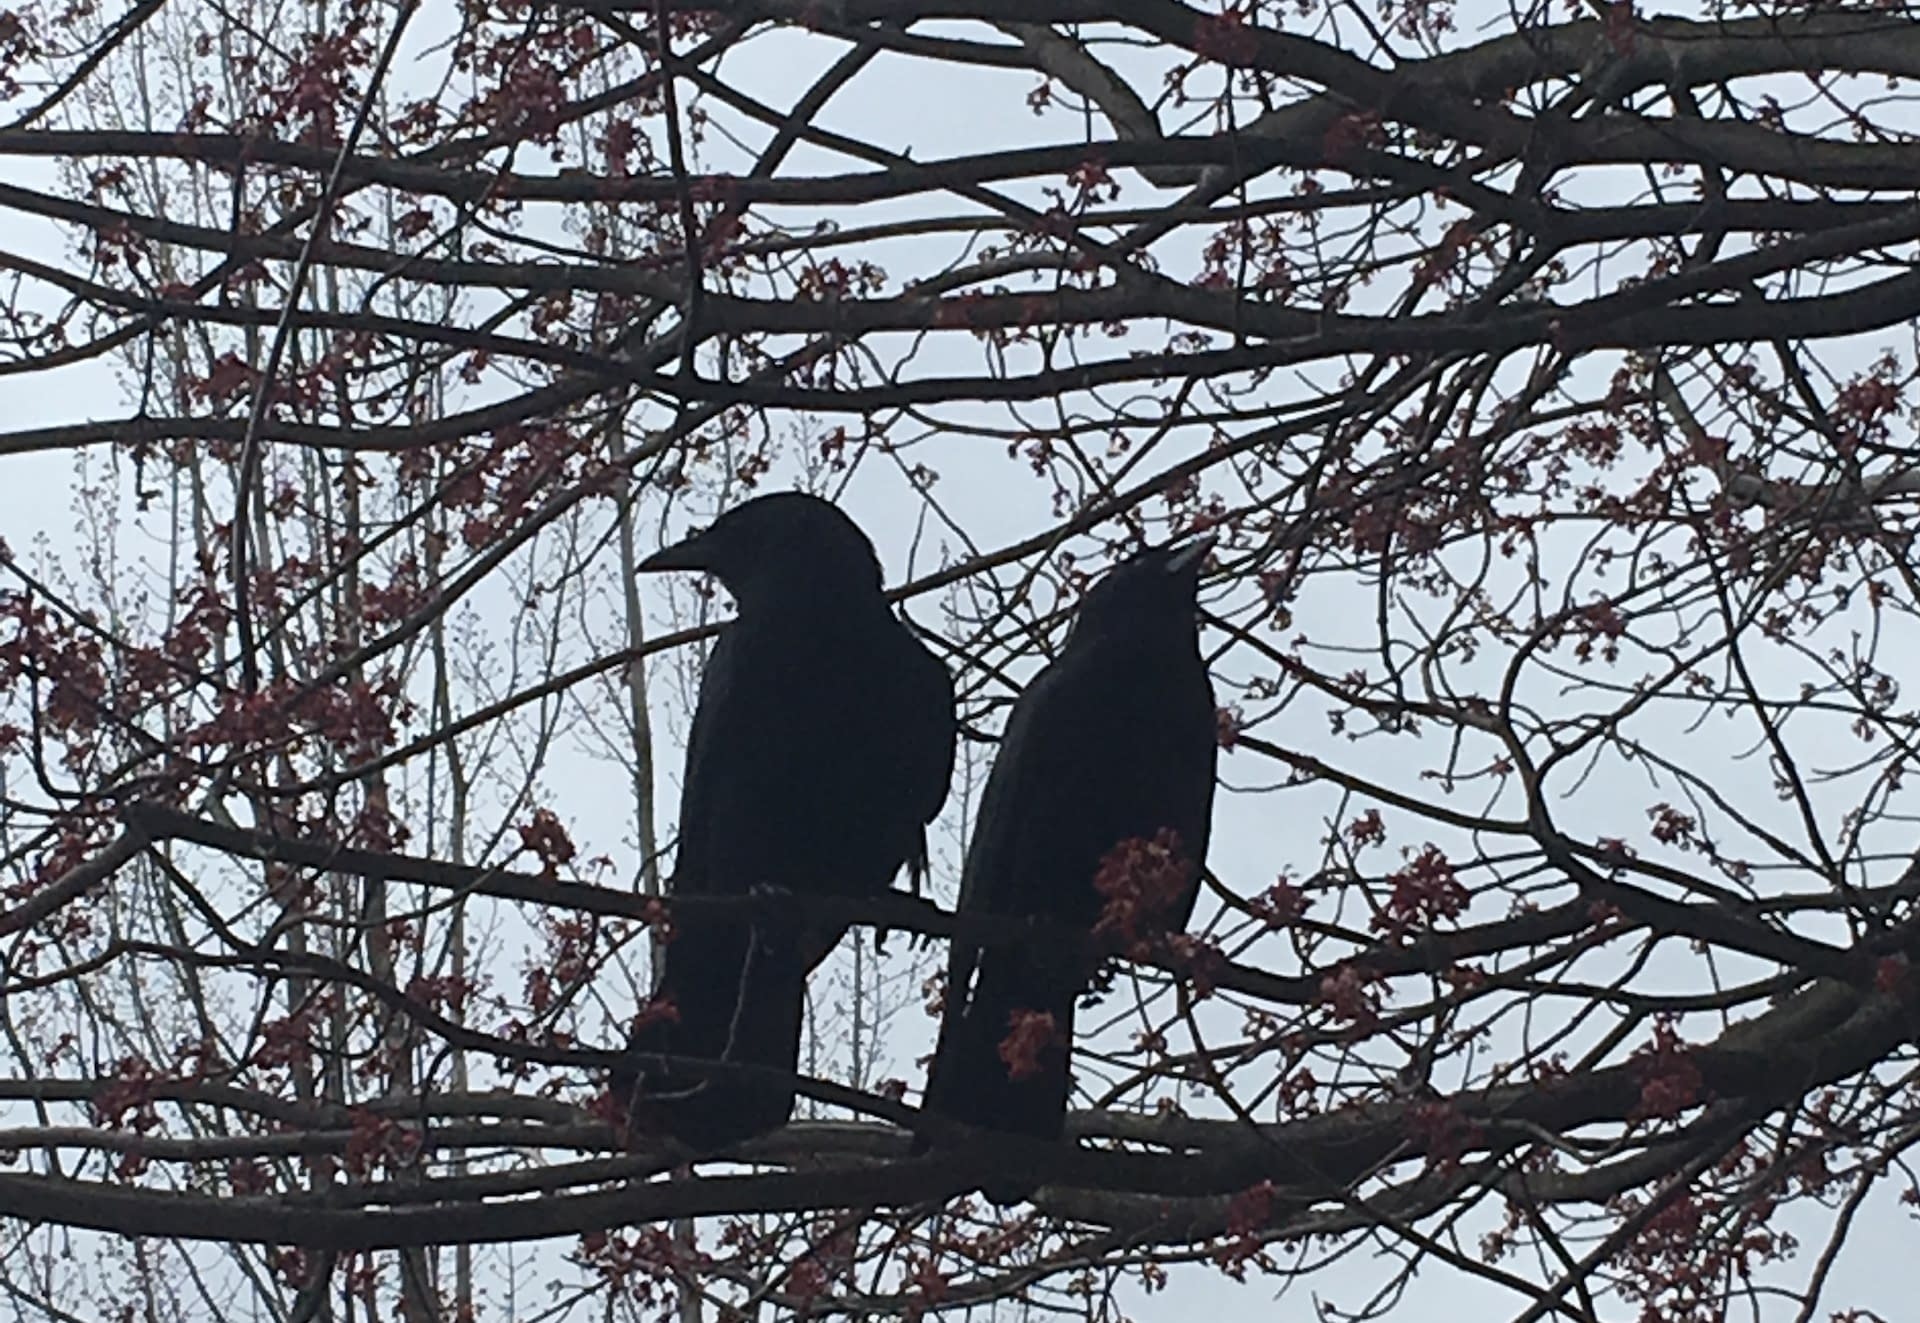 My Favorite Bird: Crows!